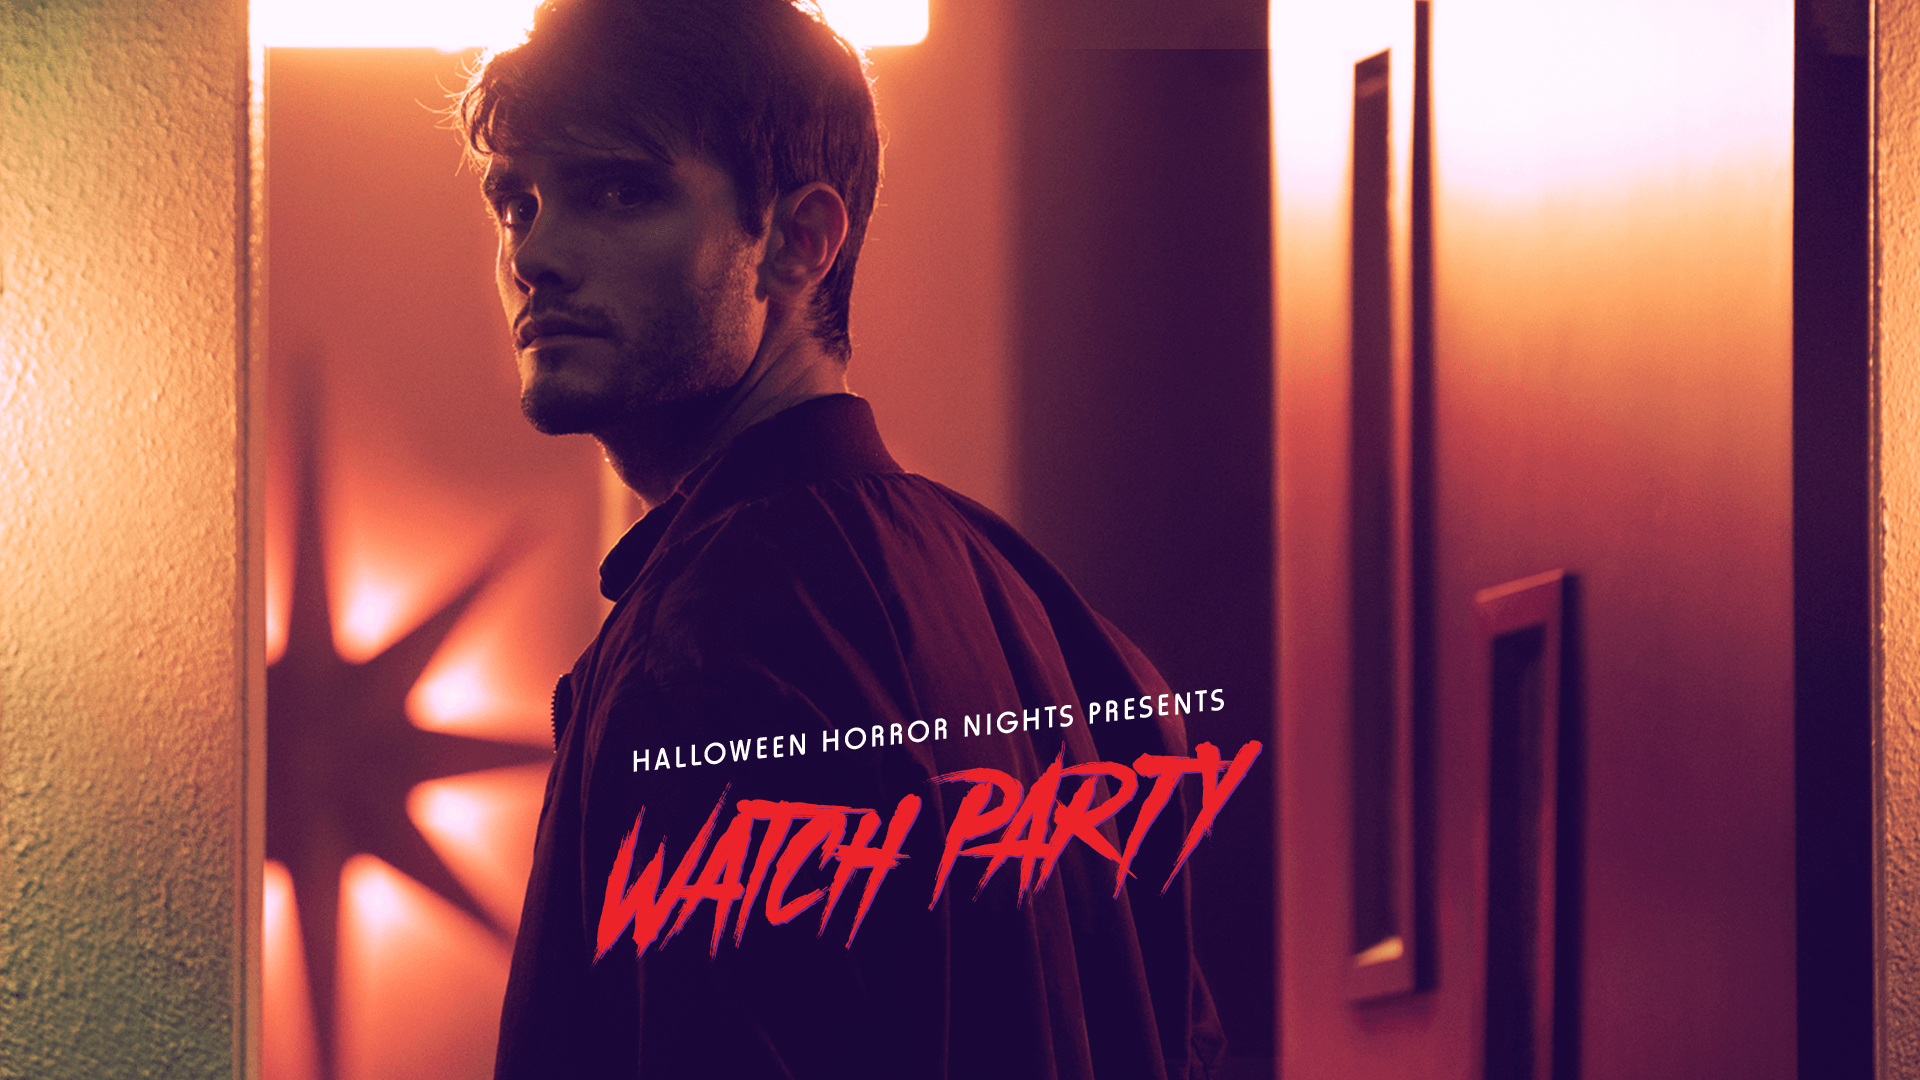 Halloween Horror Nights 2019 Poster.Halloween Horror Nights 2019 Tv Commercial Spot Released